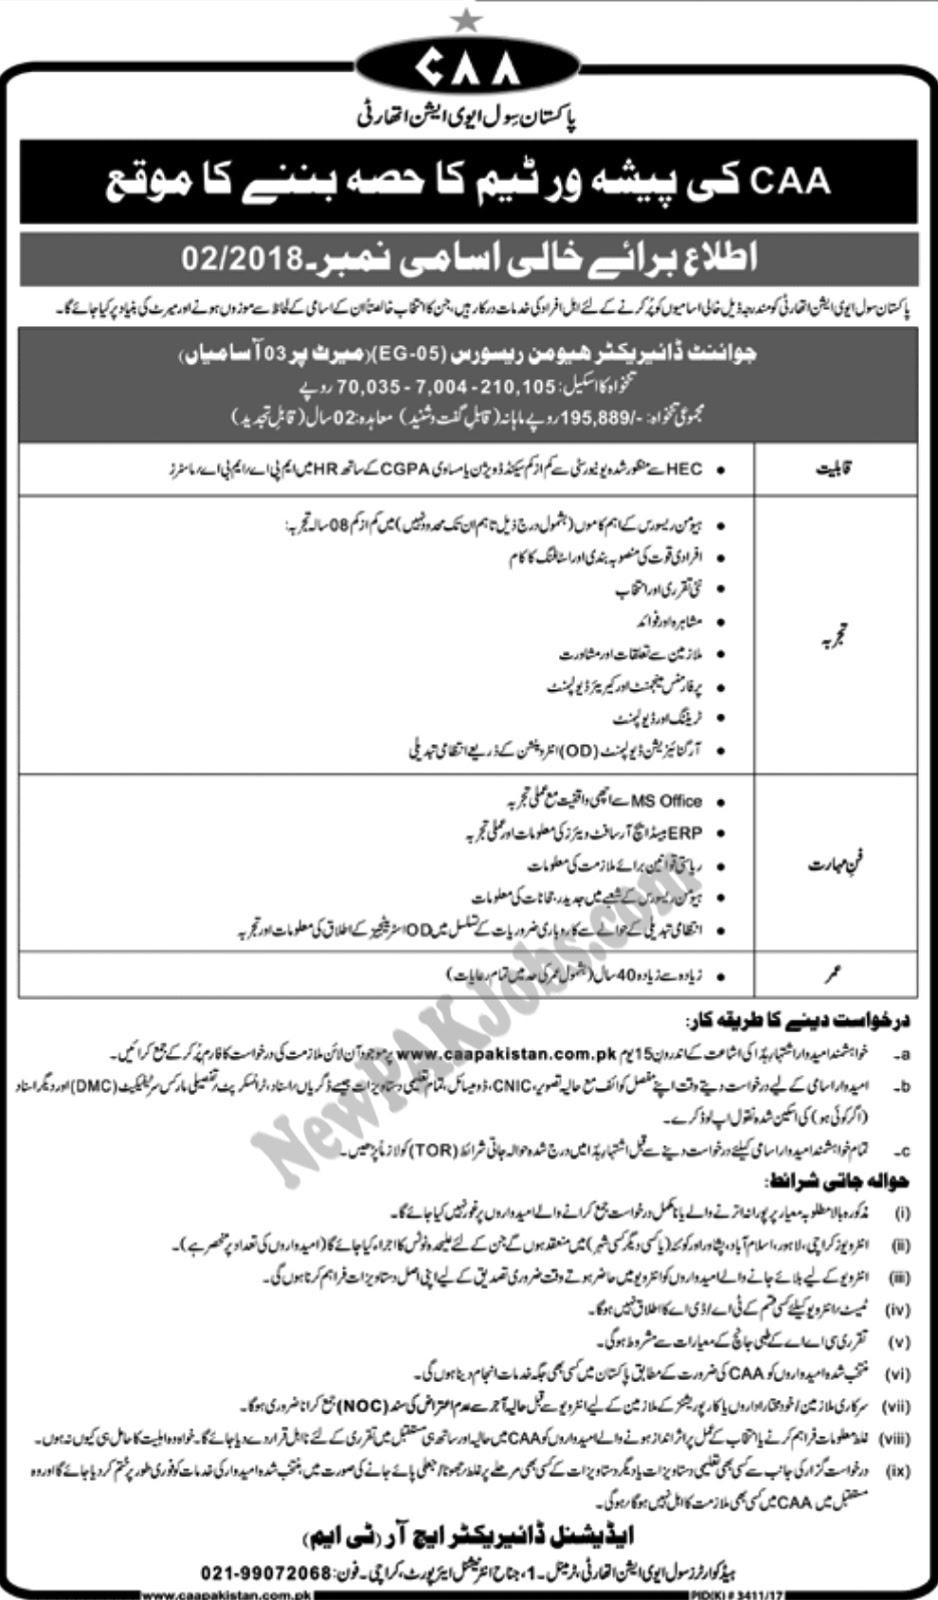 pakistan-civil-aviation-authority-caa-new-fresh-jobs-2018